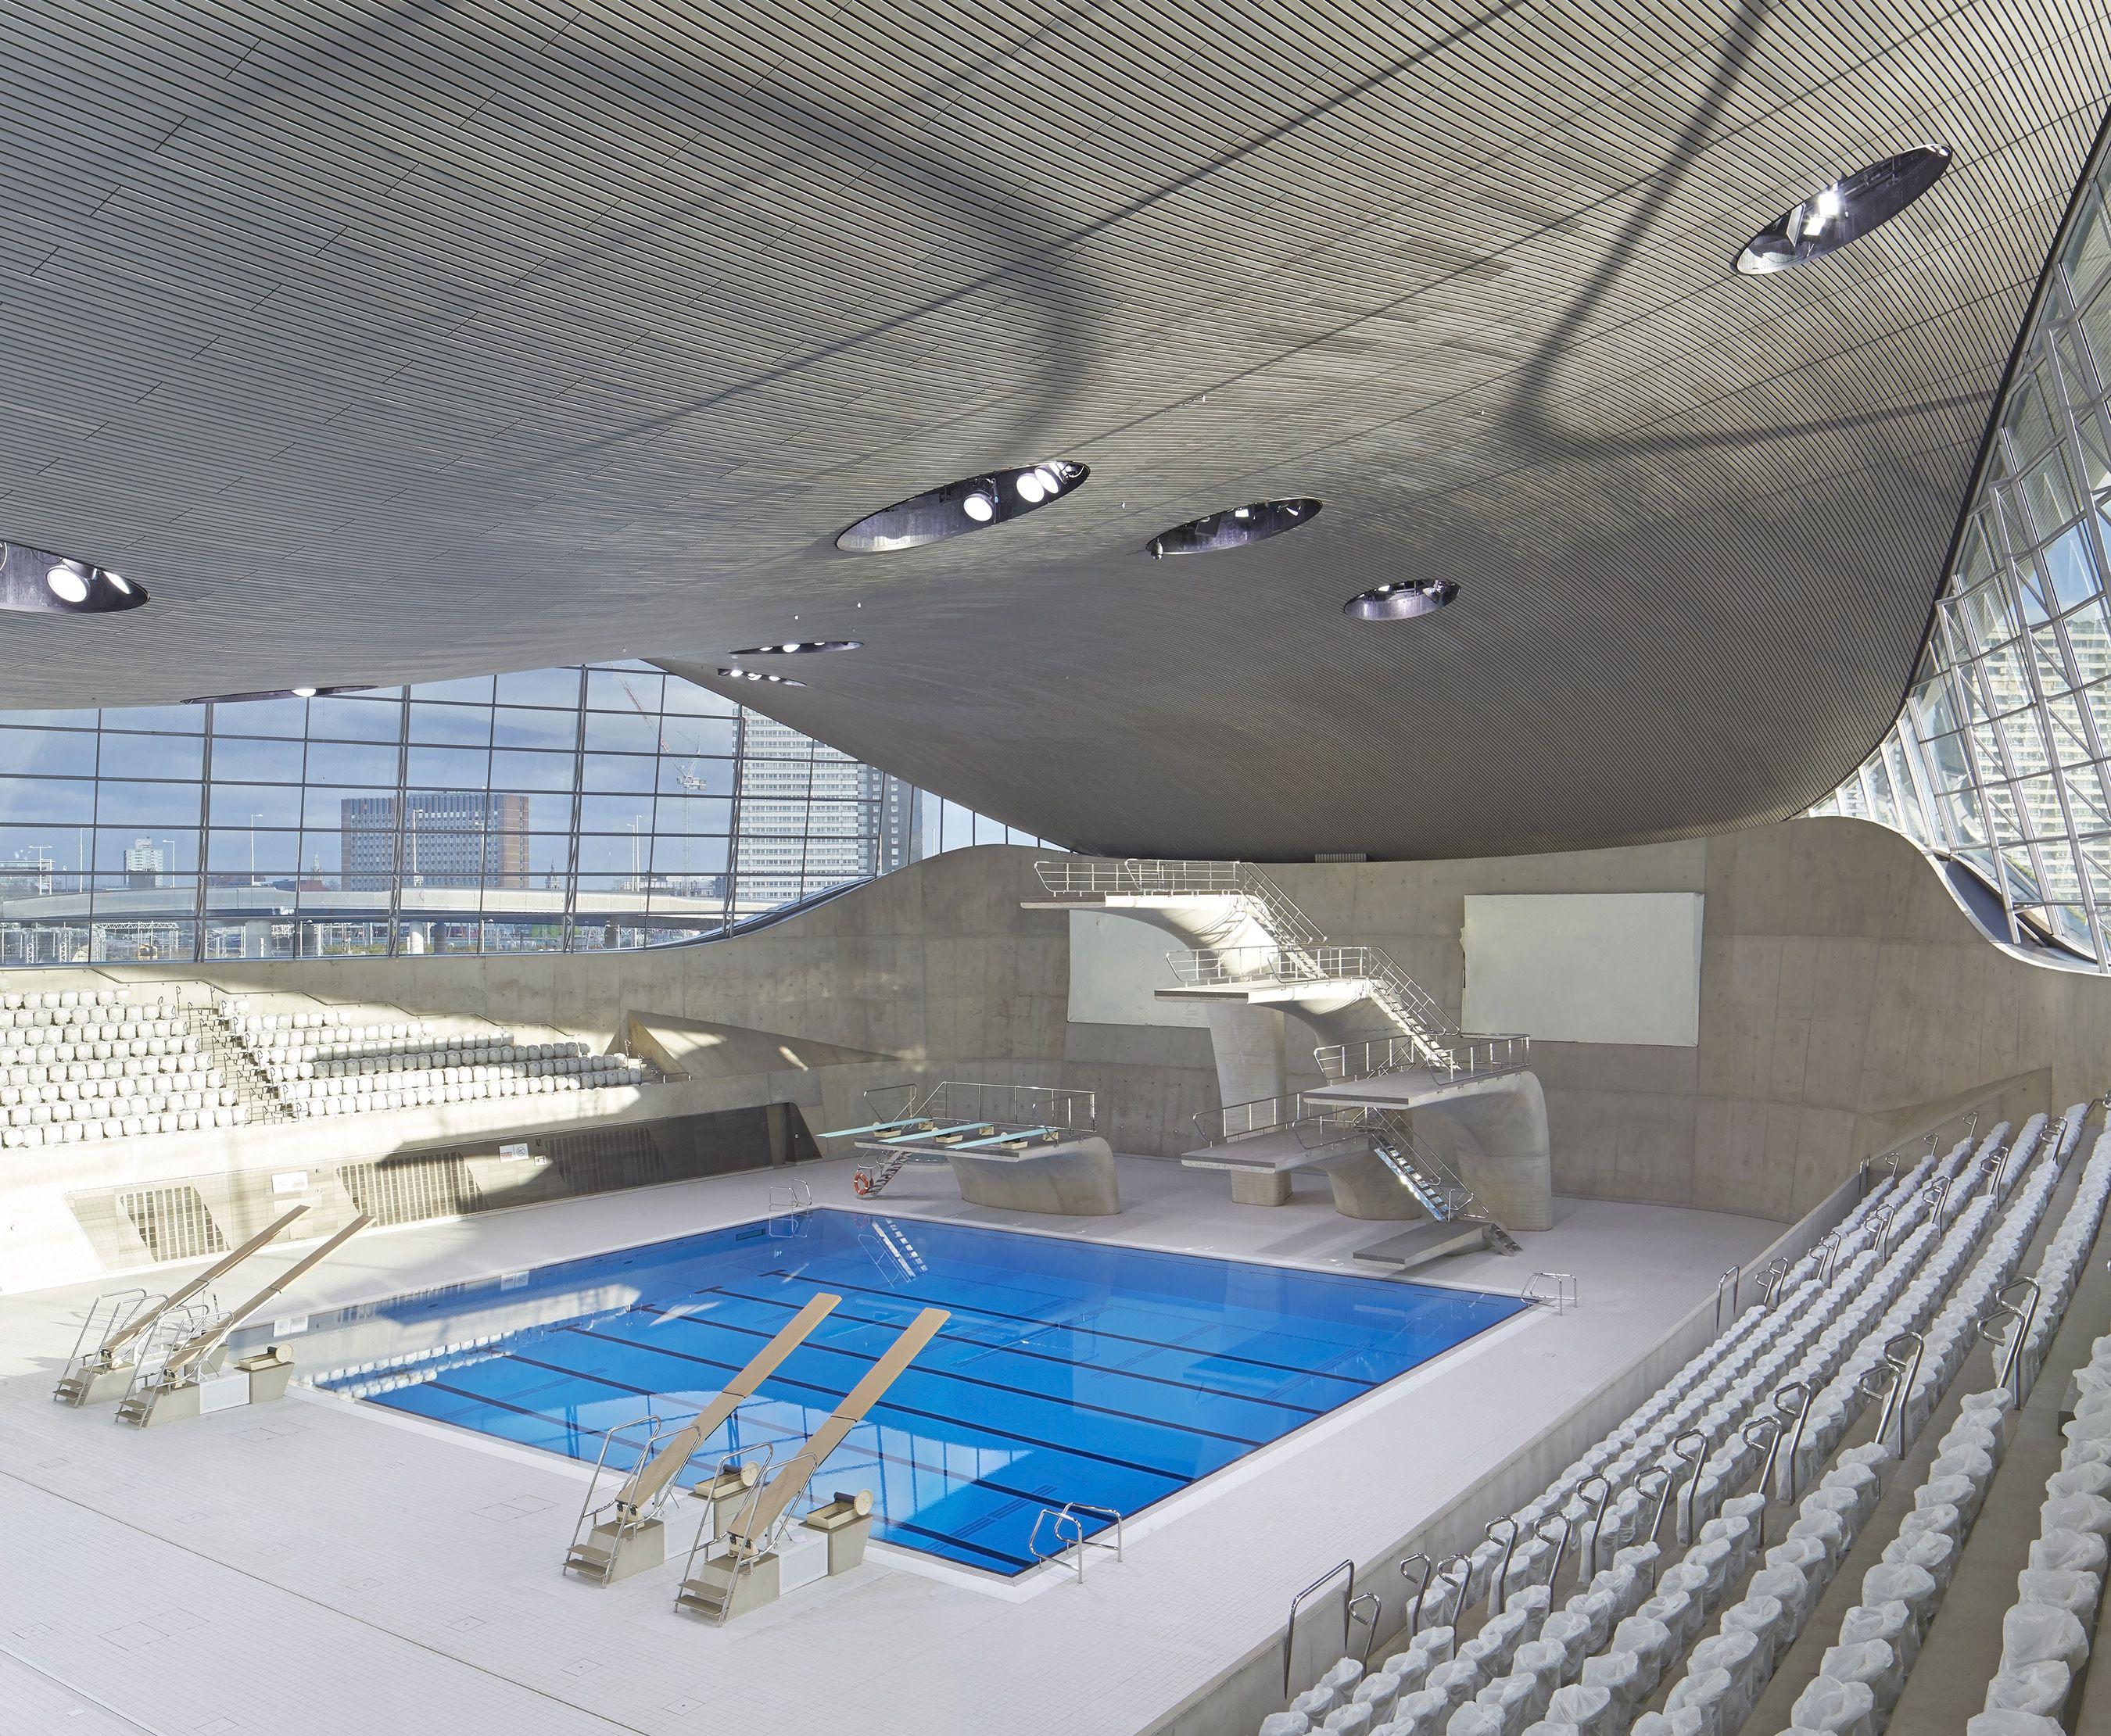 The London Aquatics Centre, Iconic Modern Concrete Architecture Design By